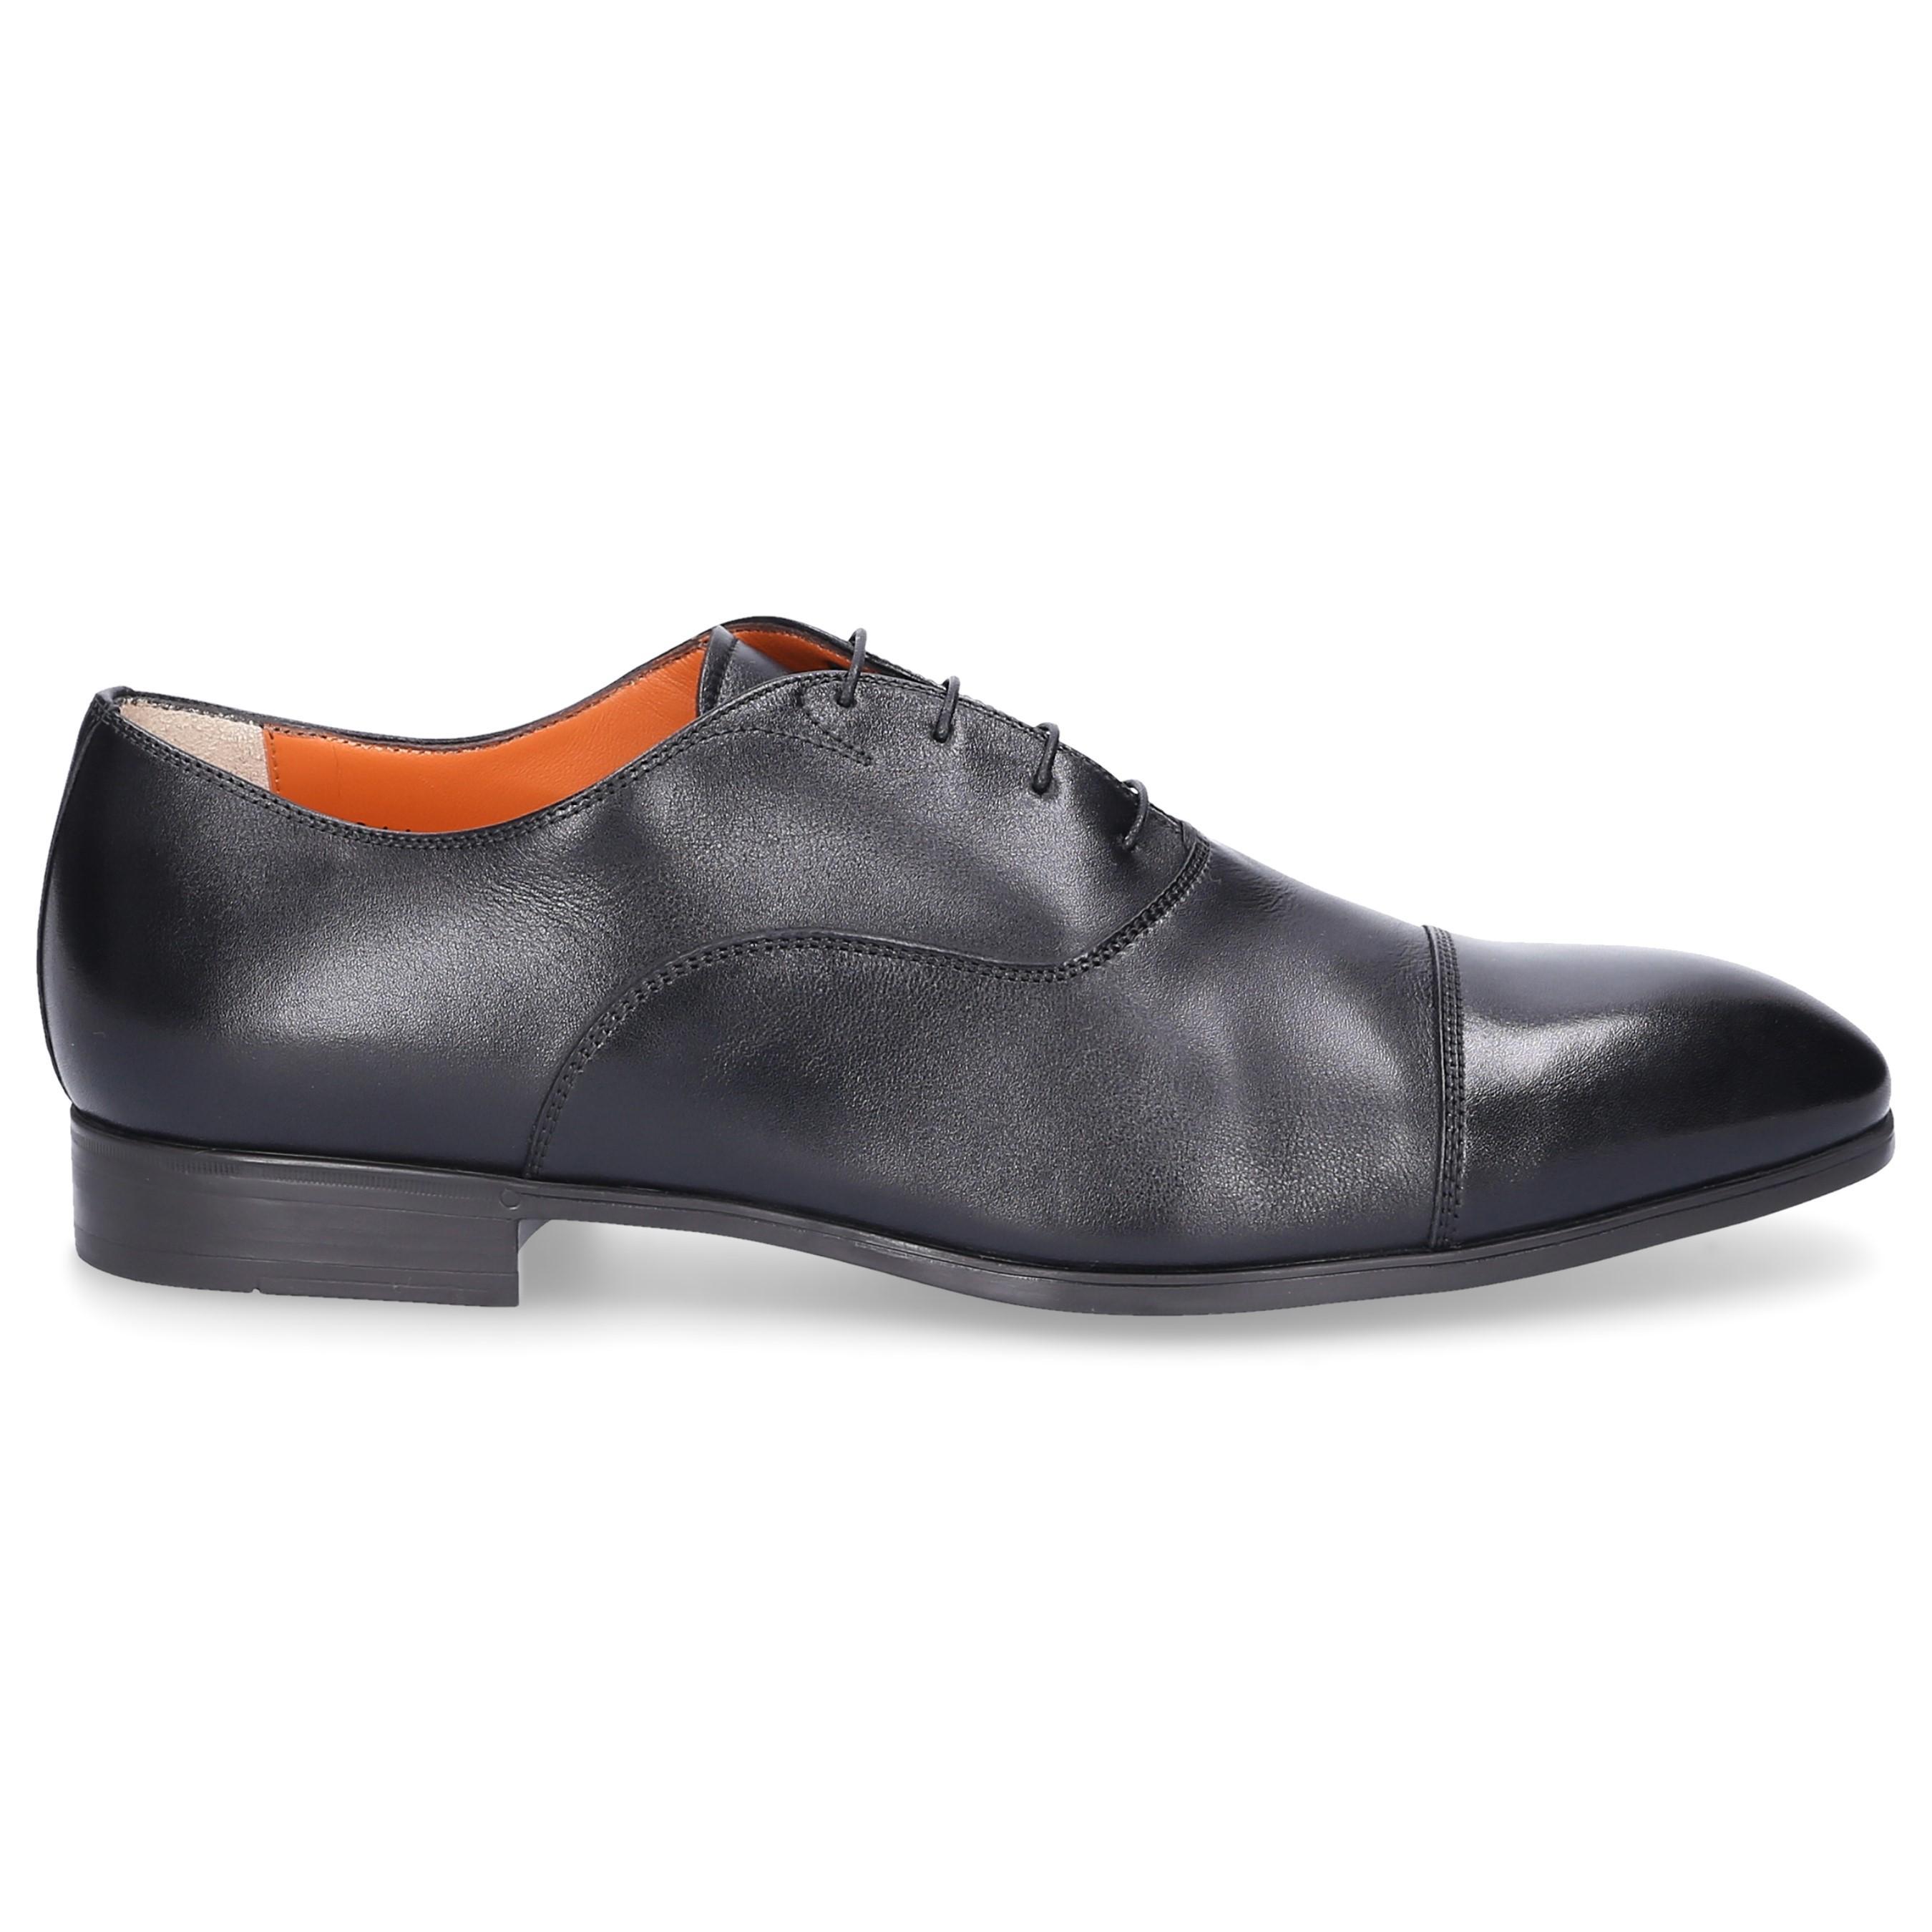 42a3be0b2b01a3 Lyst - Santoni Derby 11011 Leather Black in Black for Men